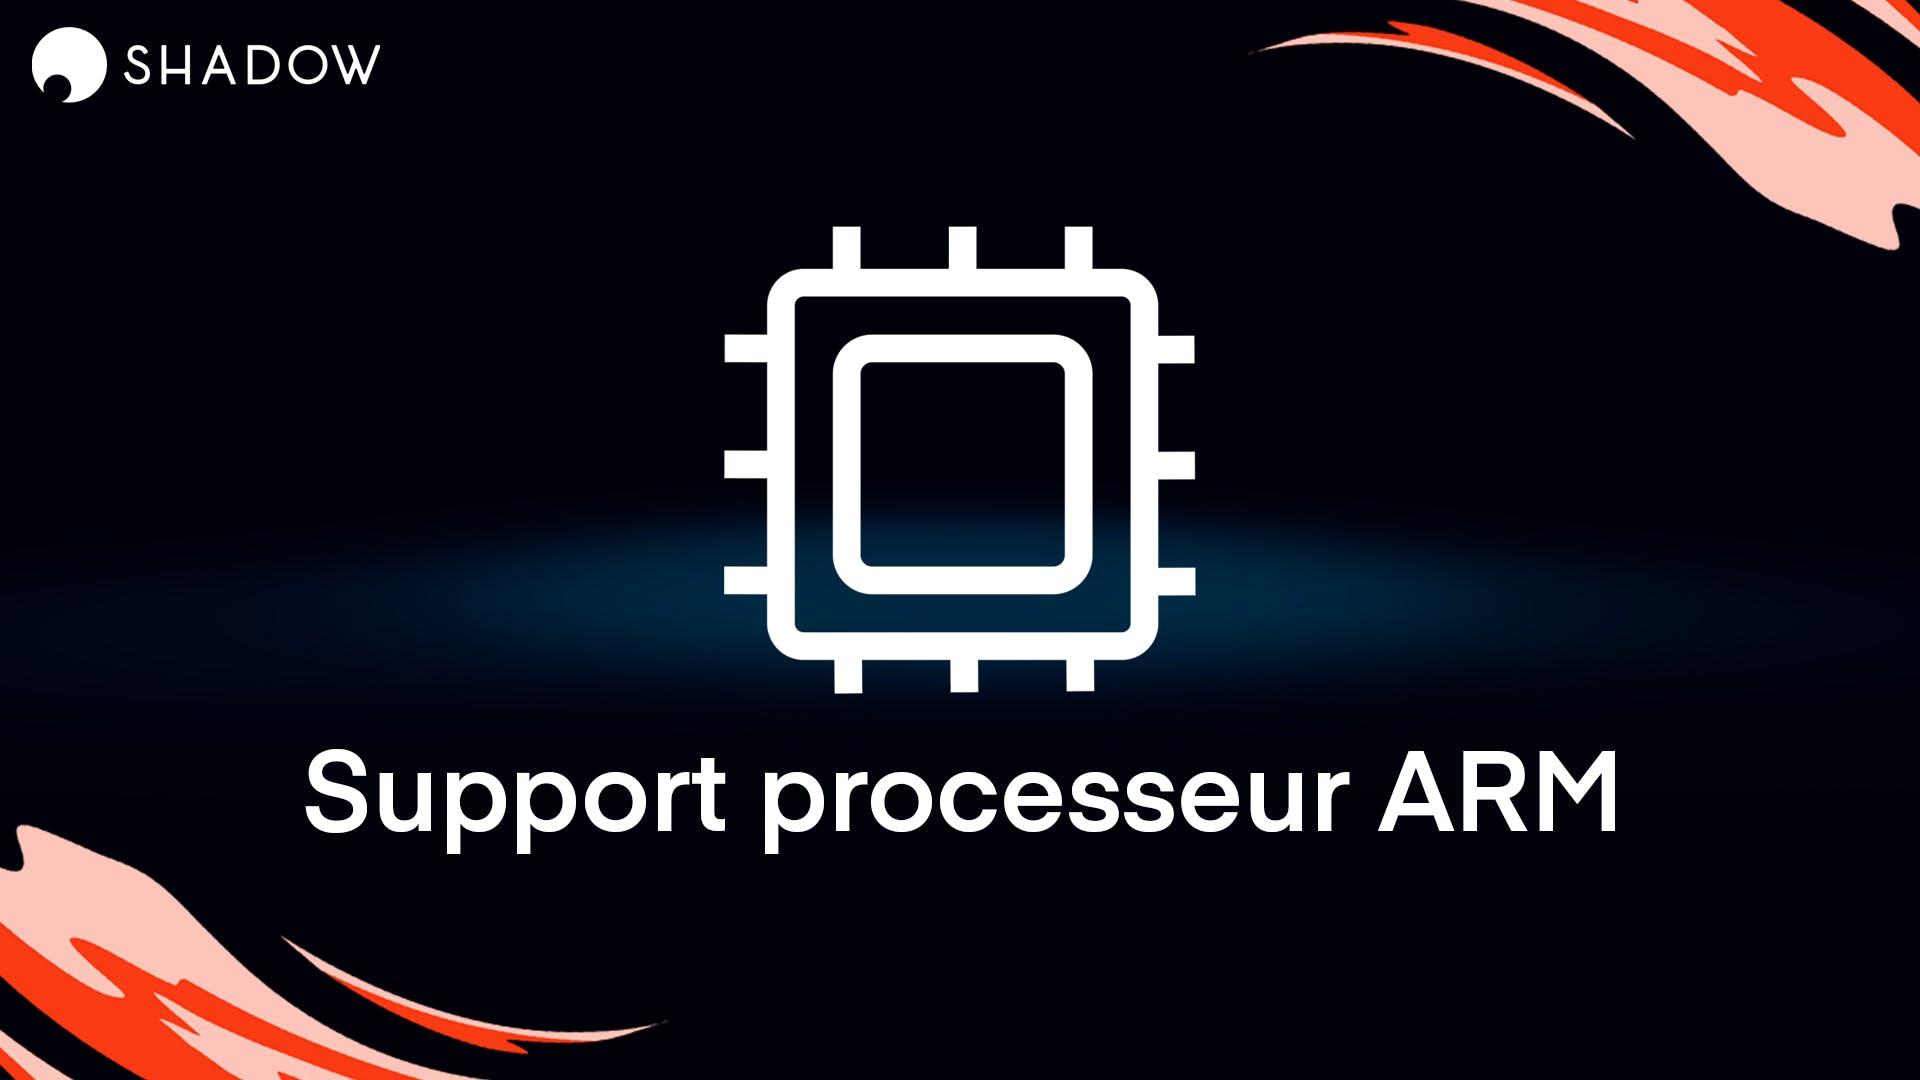 Processeur ARM Shadow